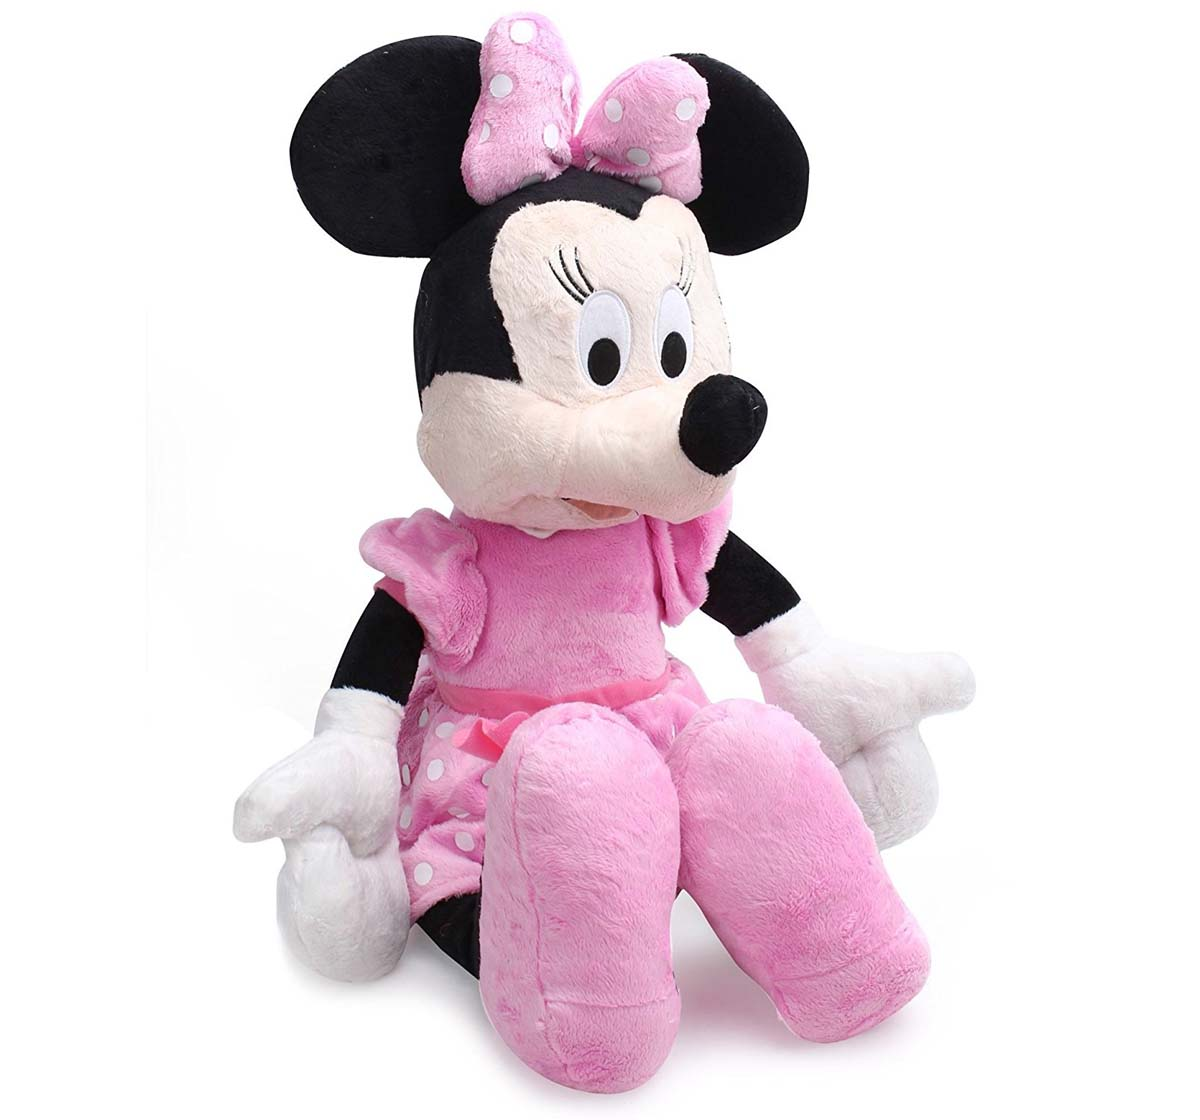 Disney | Disney Minnie Flopsie, 10 Inch Character Soft Toys for Kids age 12M+ 19 Cm